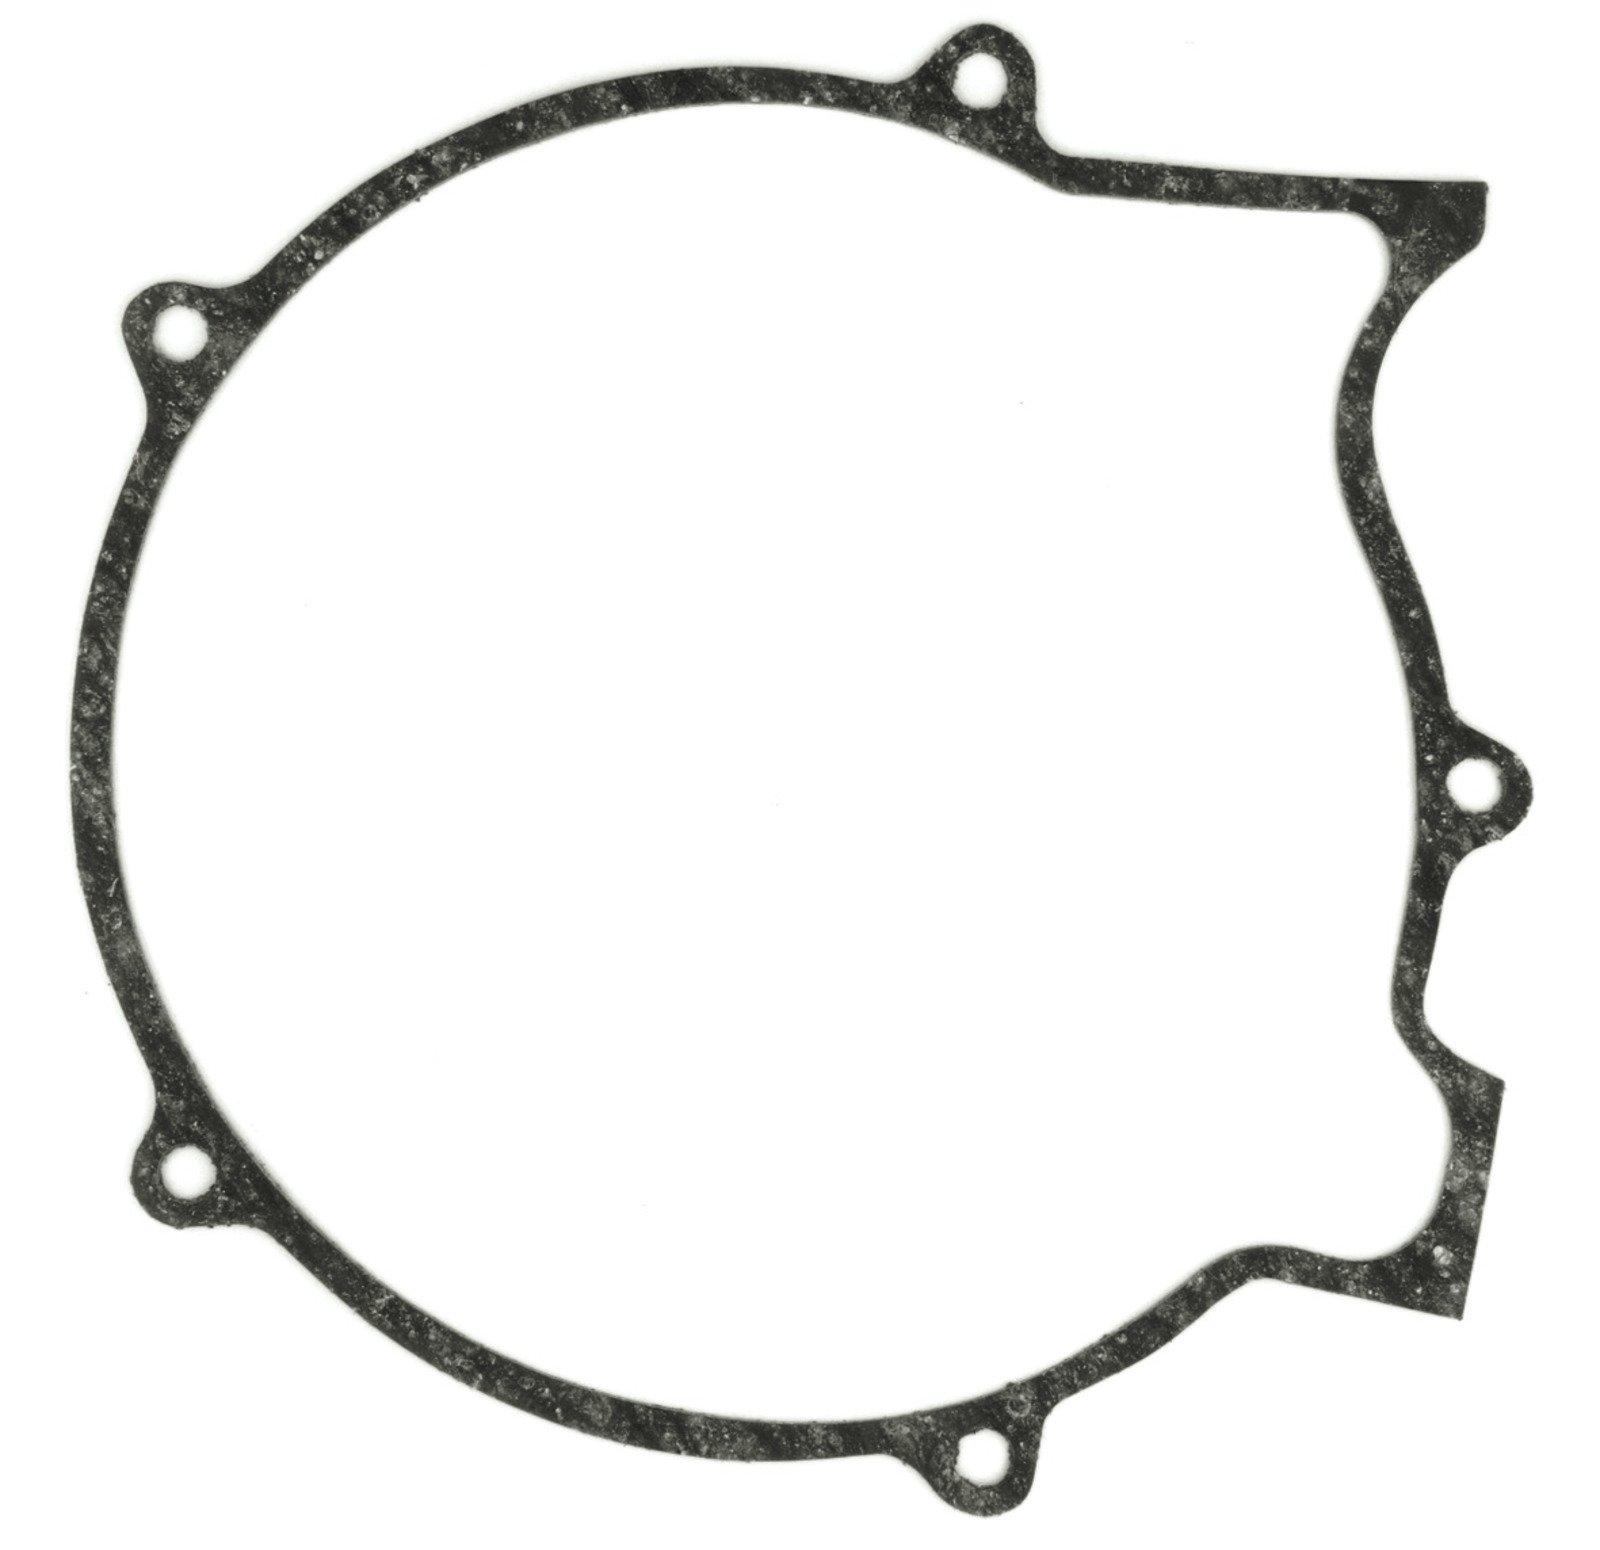 Left Hand Crankcase Generator Cover Gasket  SR500 TT500 XT500  3HT-15451-00-00 5-115